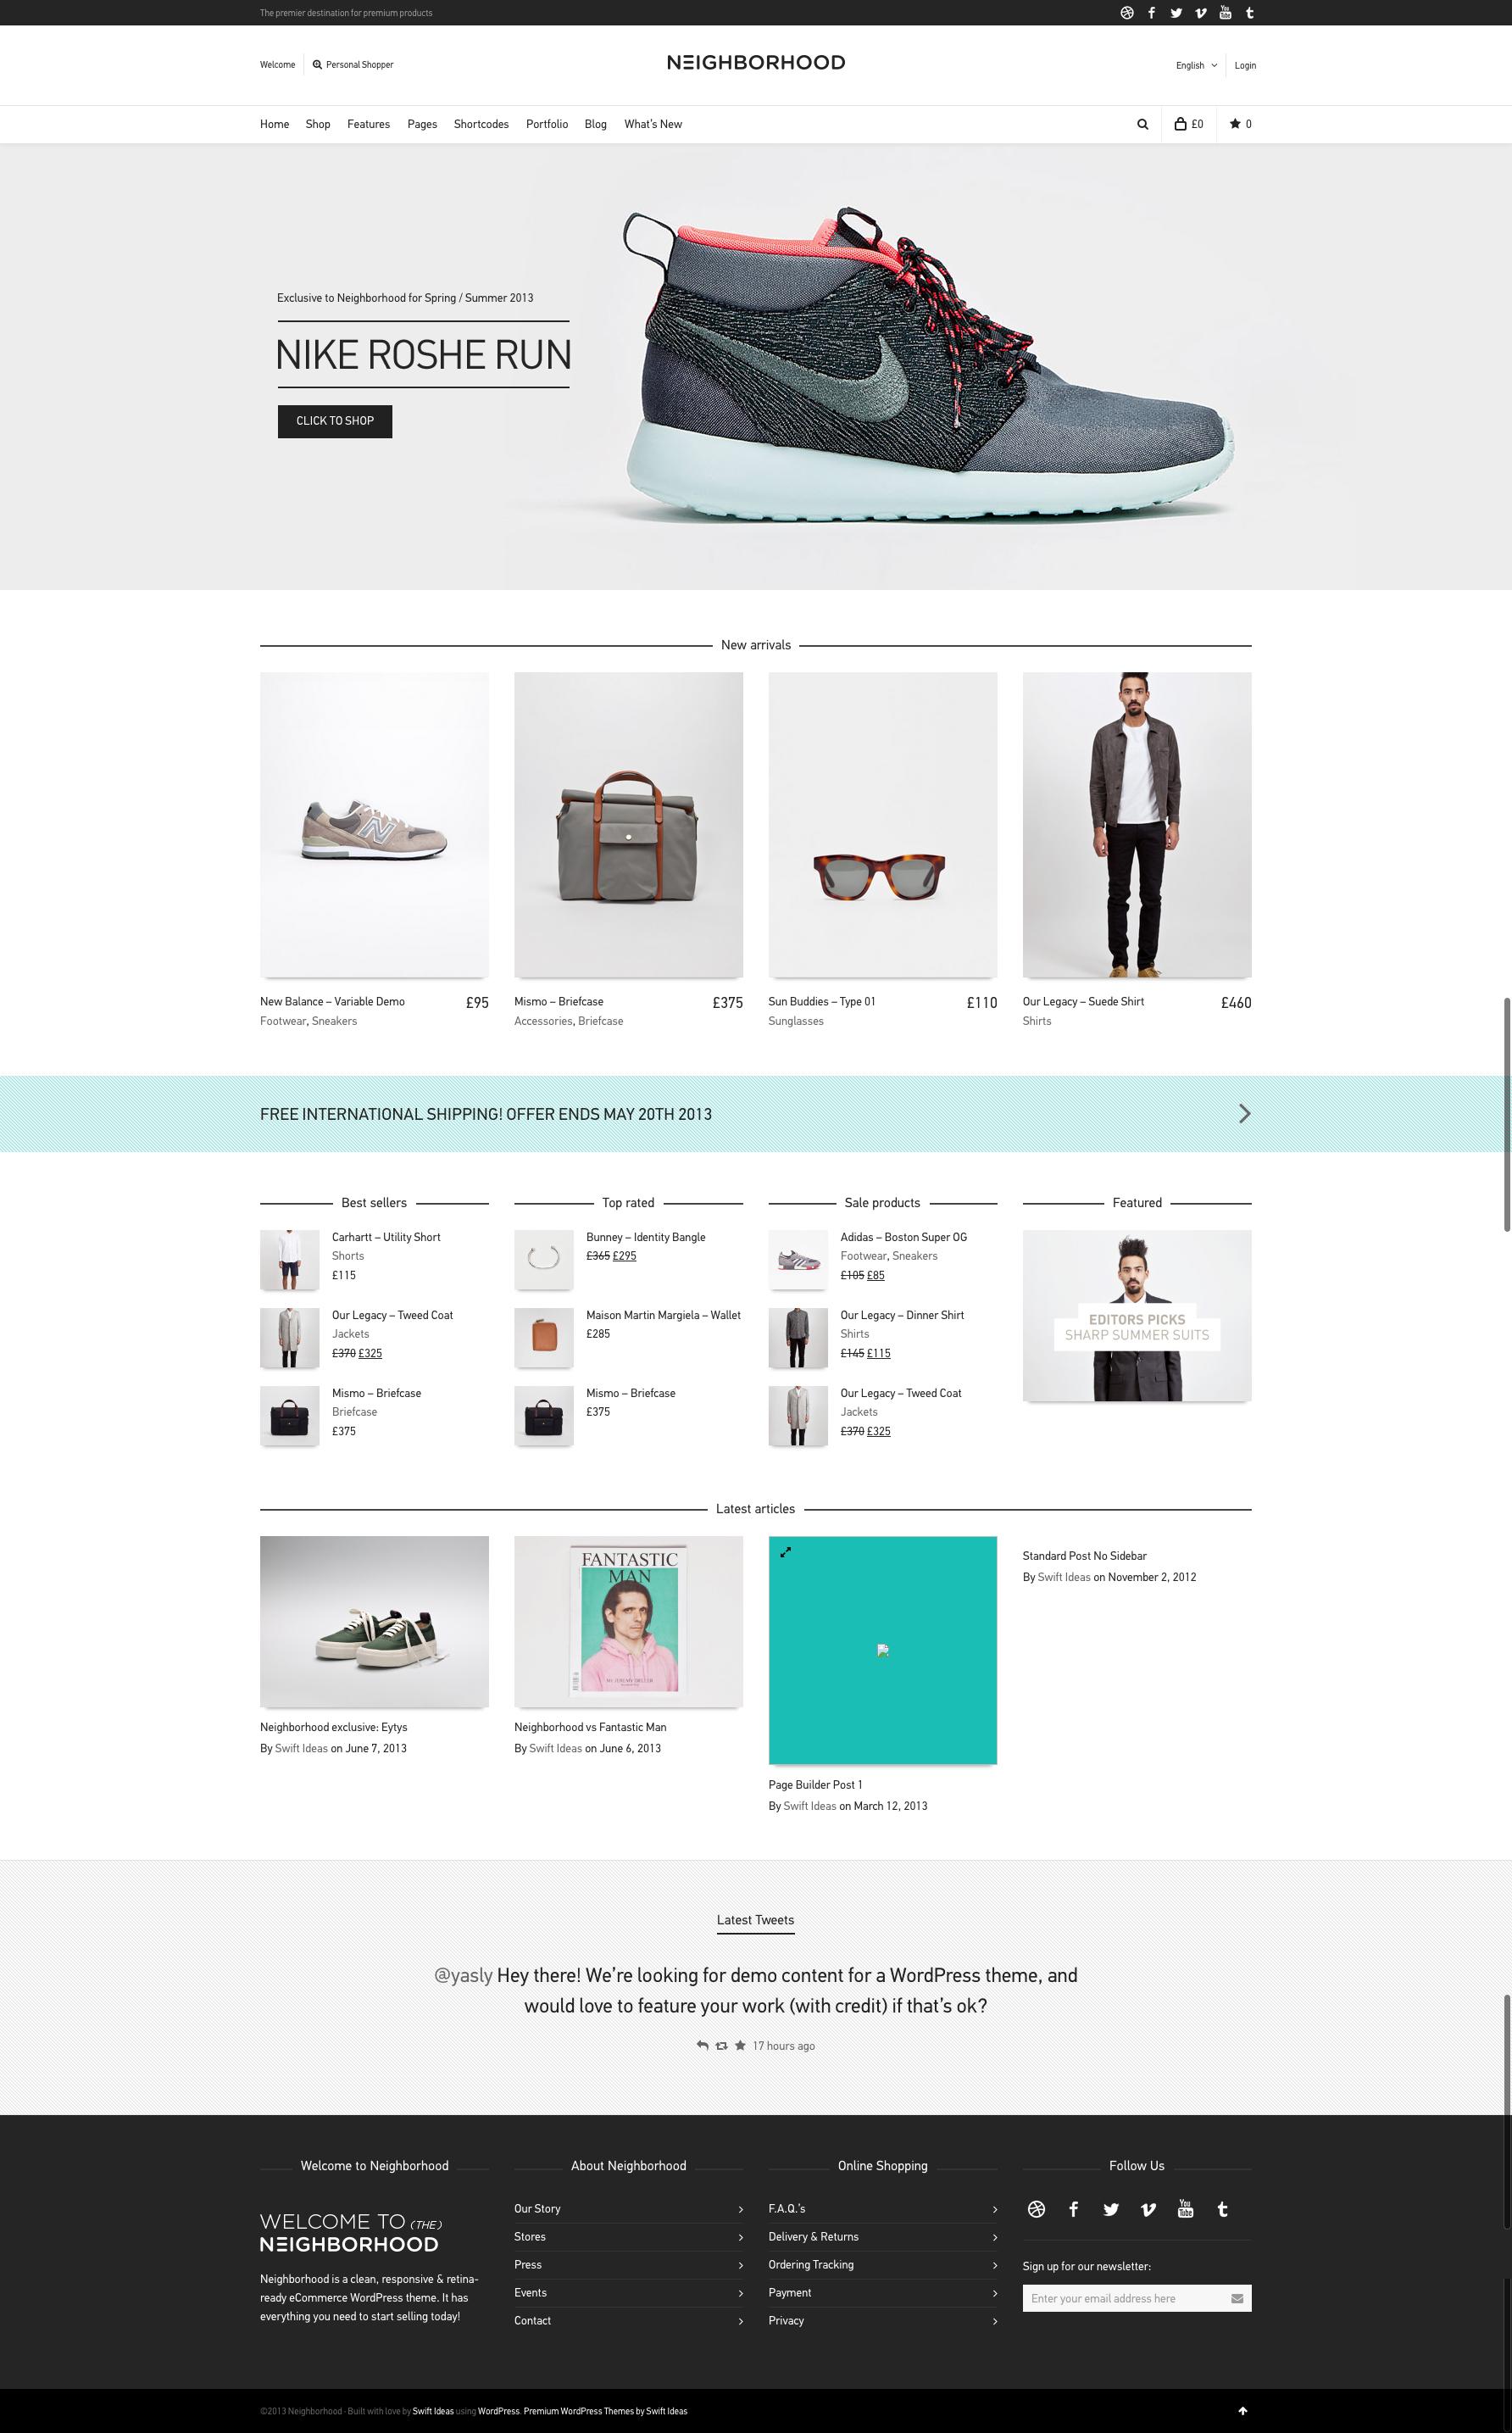 Professionelles Design Noch Einmal Nike 2013 Weiß Dann